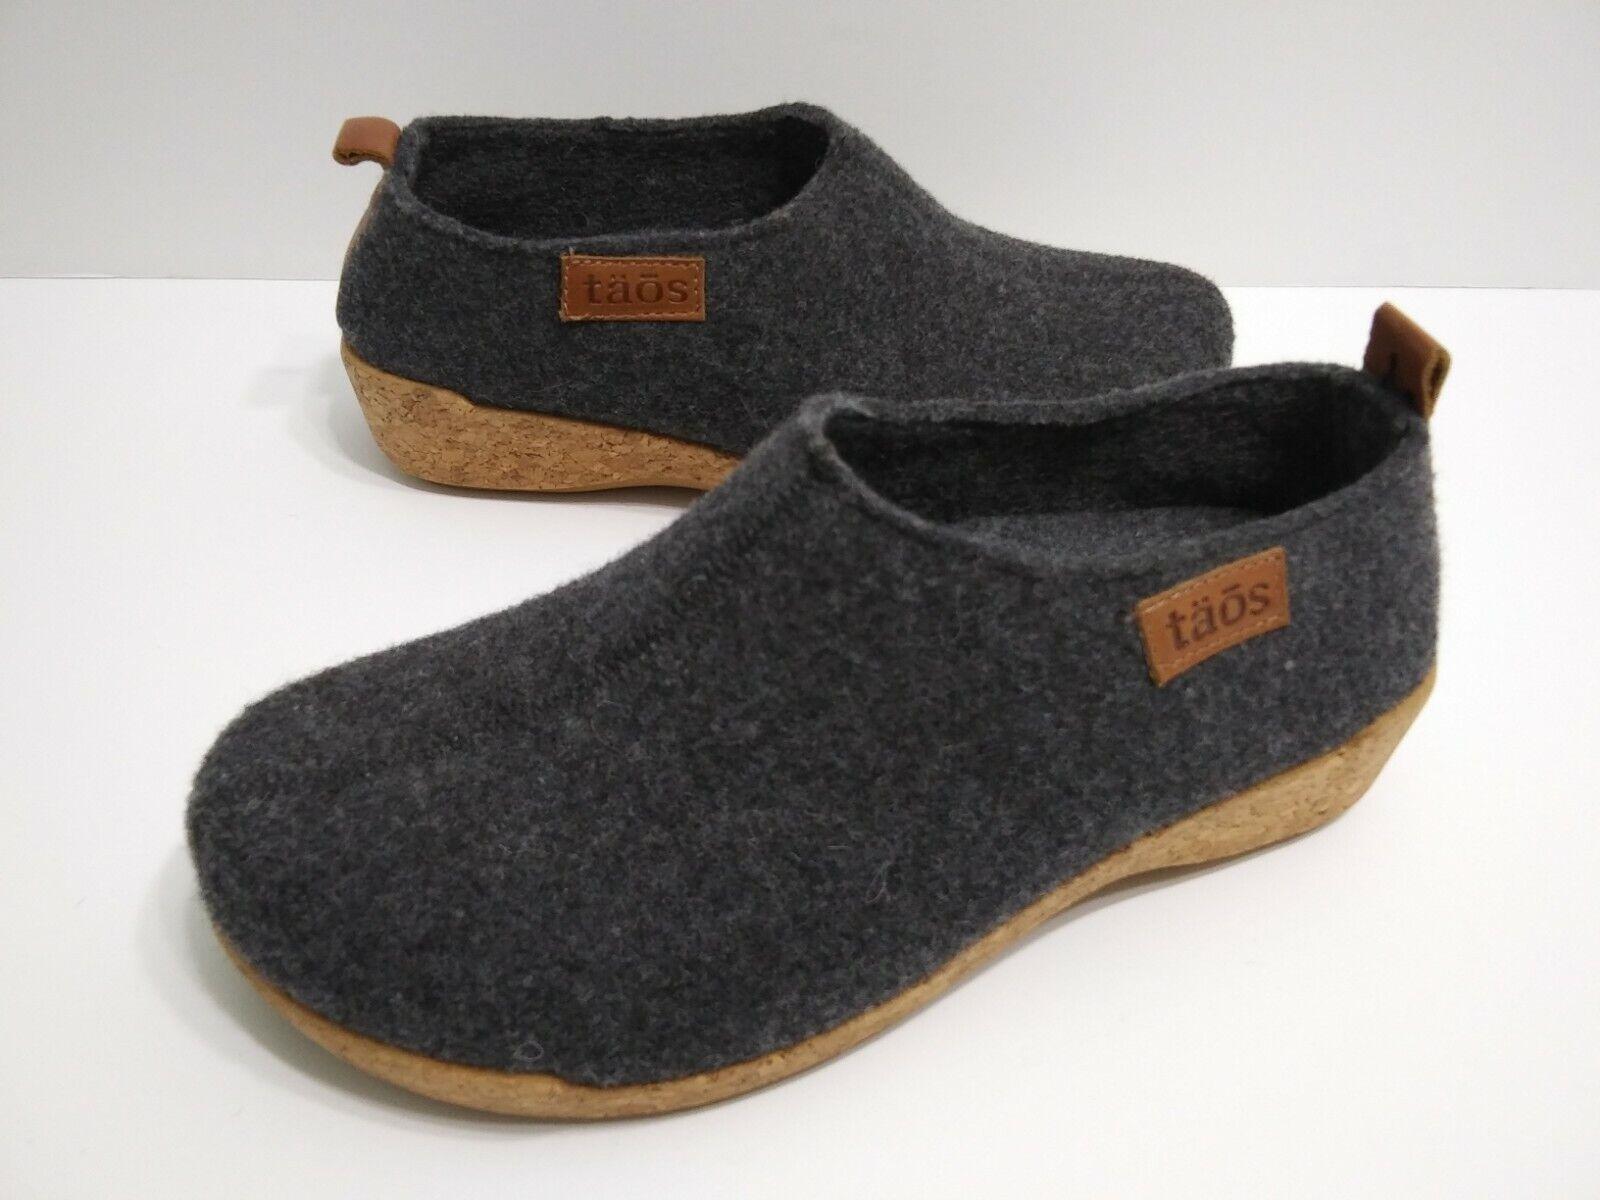 Taos Wonderwool Wool Mule Clogs Slip On Shoes Womens Size 36 Us 5-5.5 Grey Gray